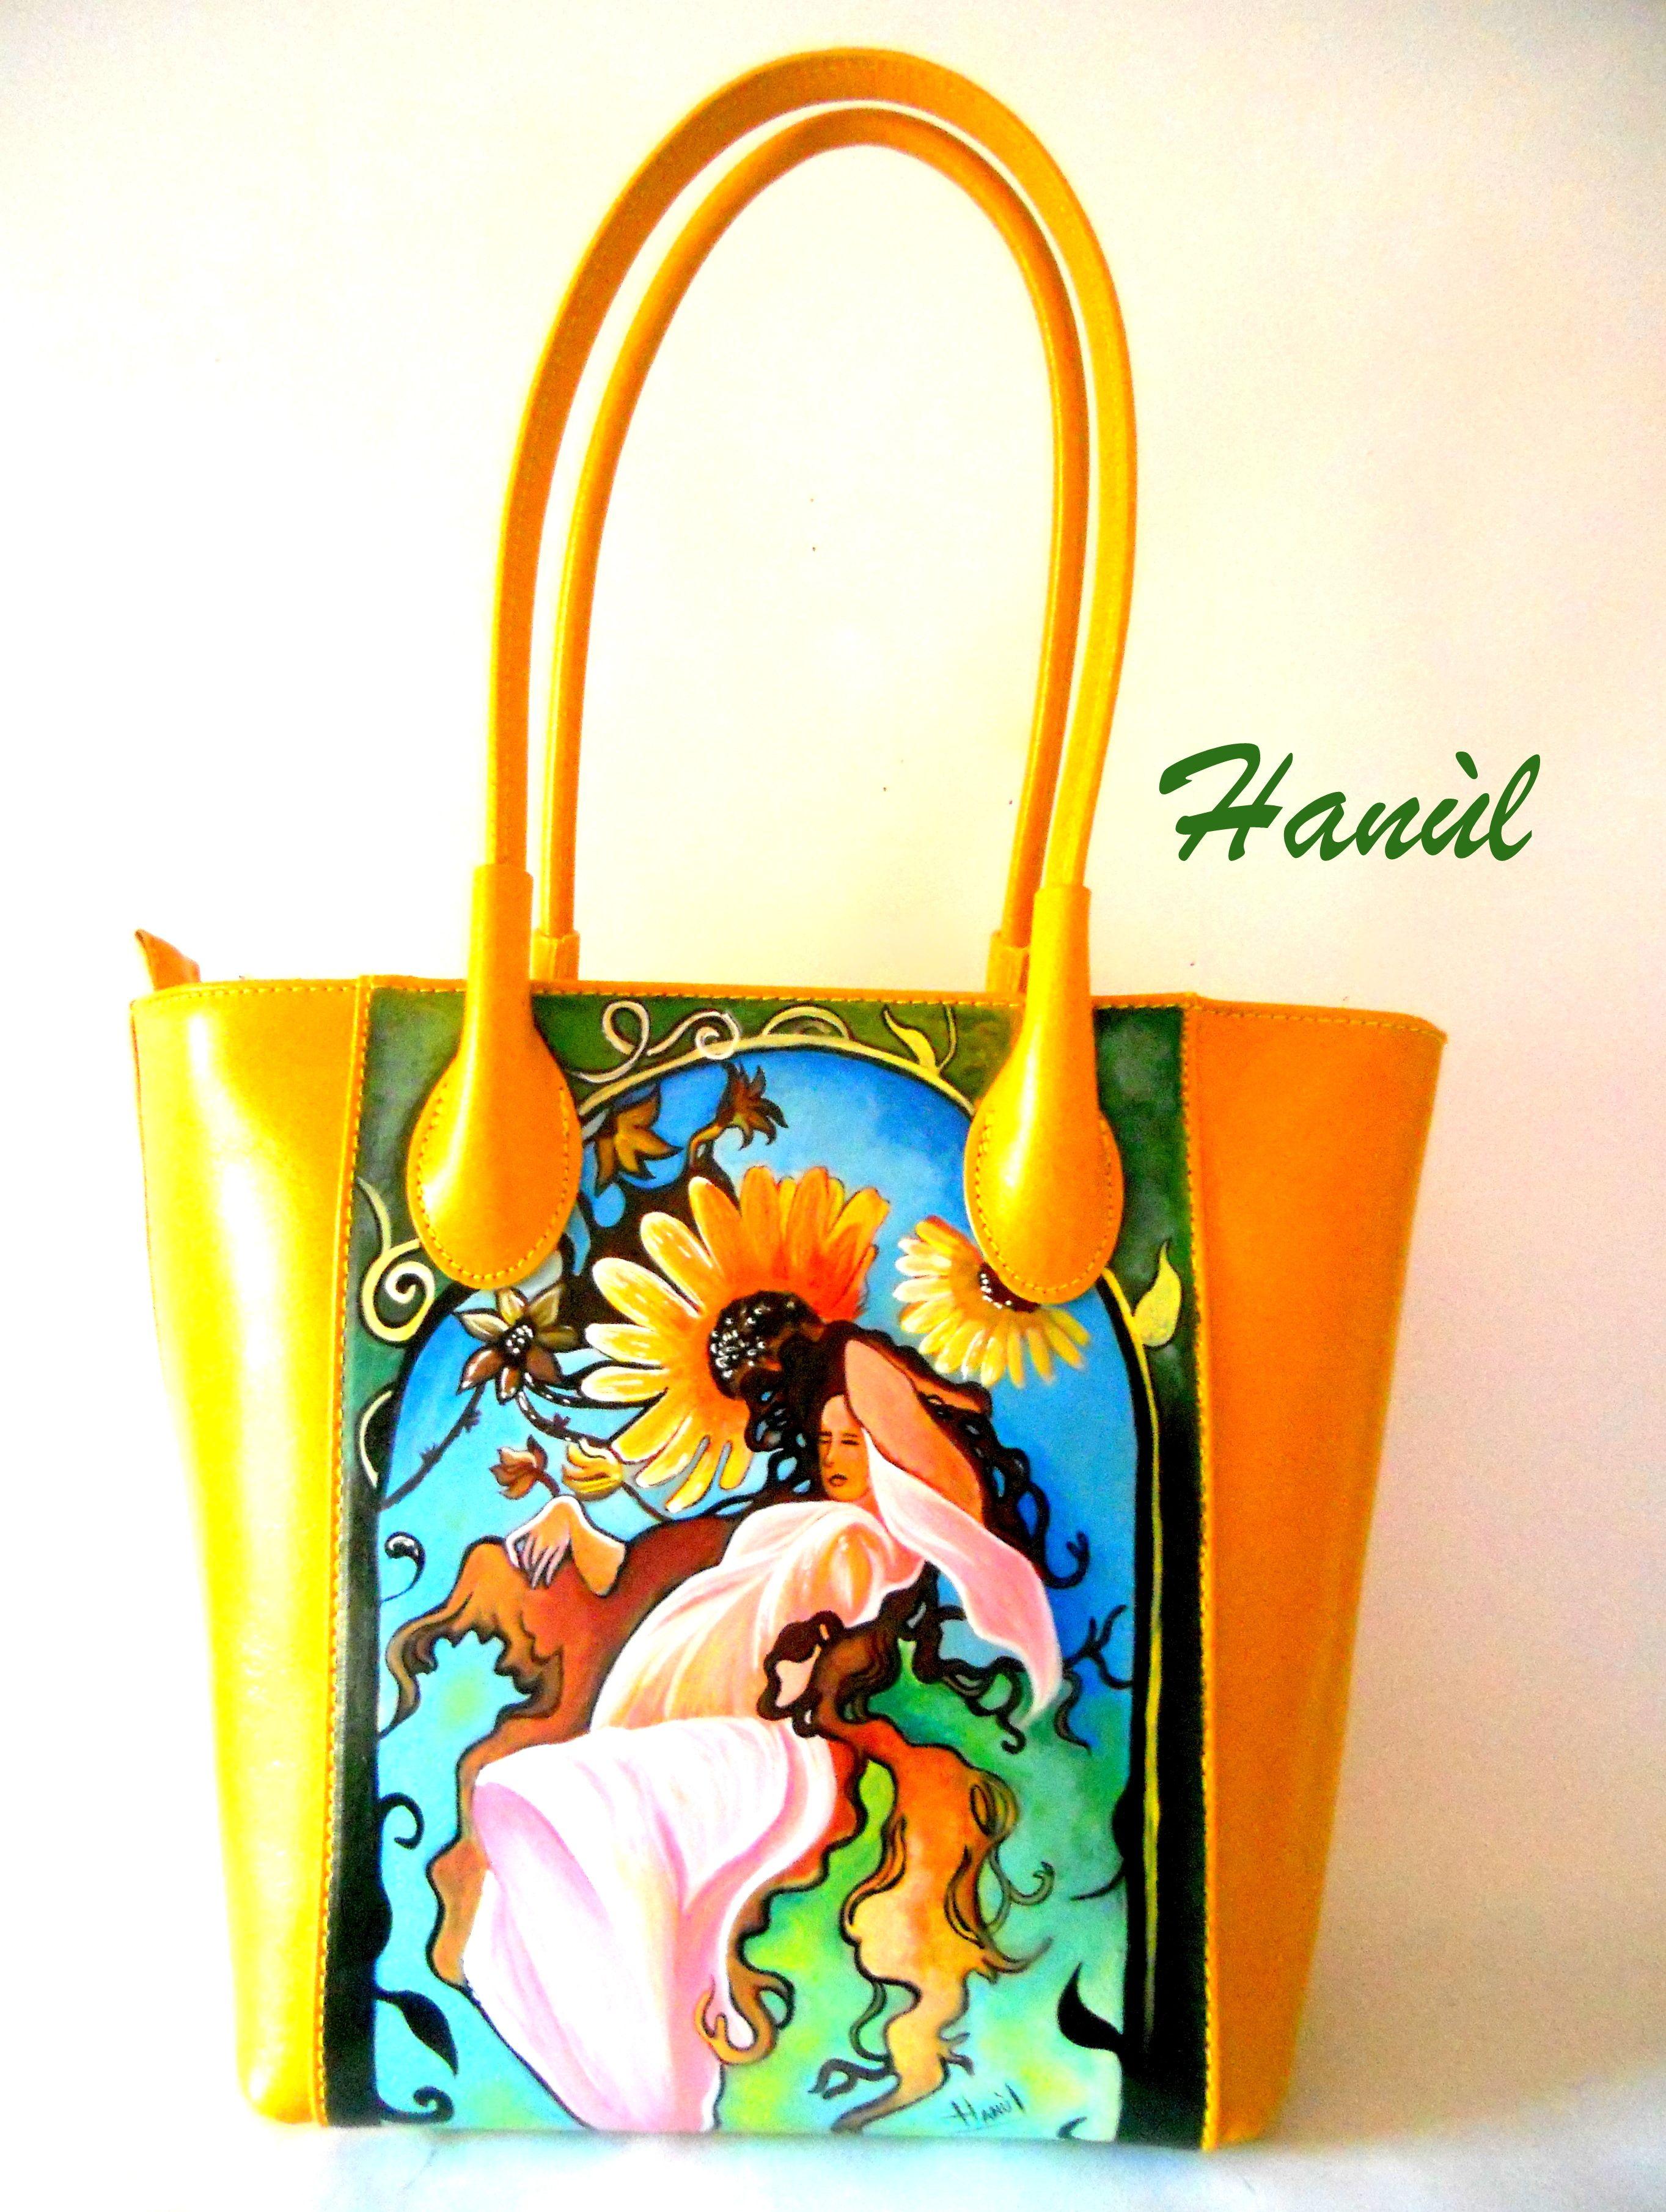 Borsa in pelle gialla dipinta a mano, L'ESTATE, di Alphonse Mucha #borsedipinteamano #borsedipinte #handpaintedbags